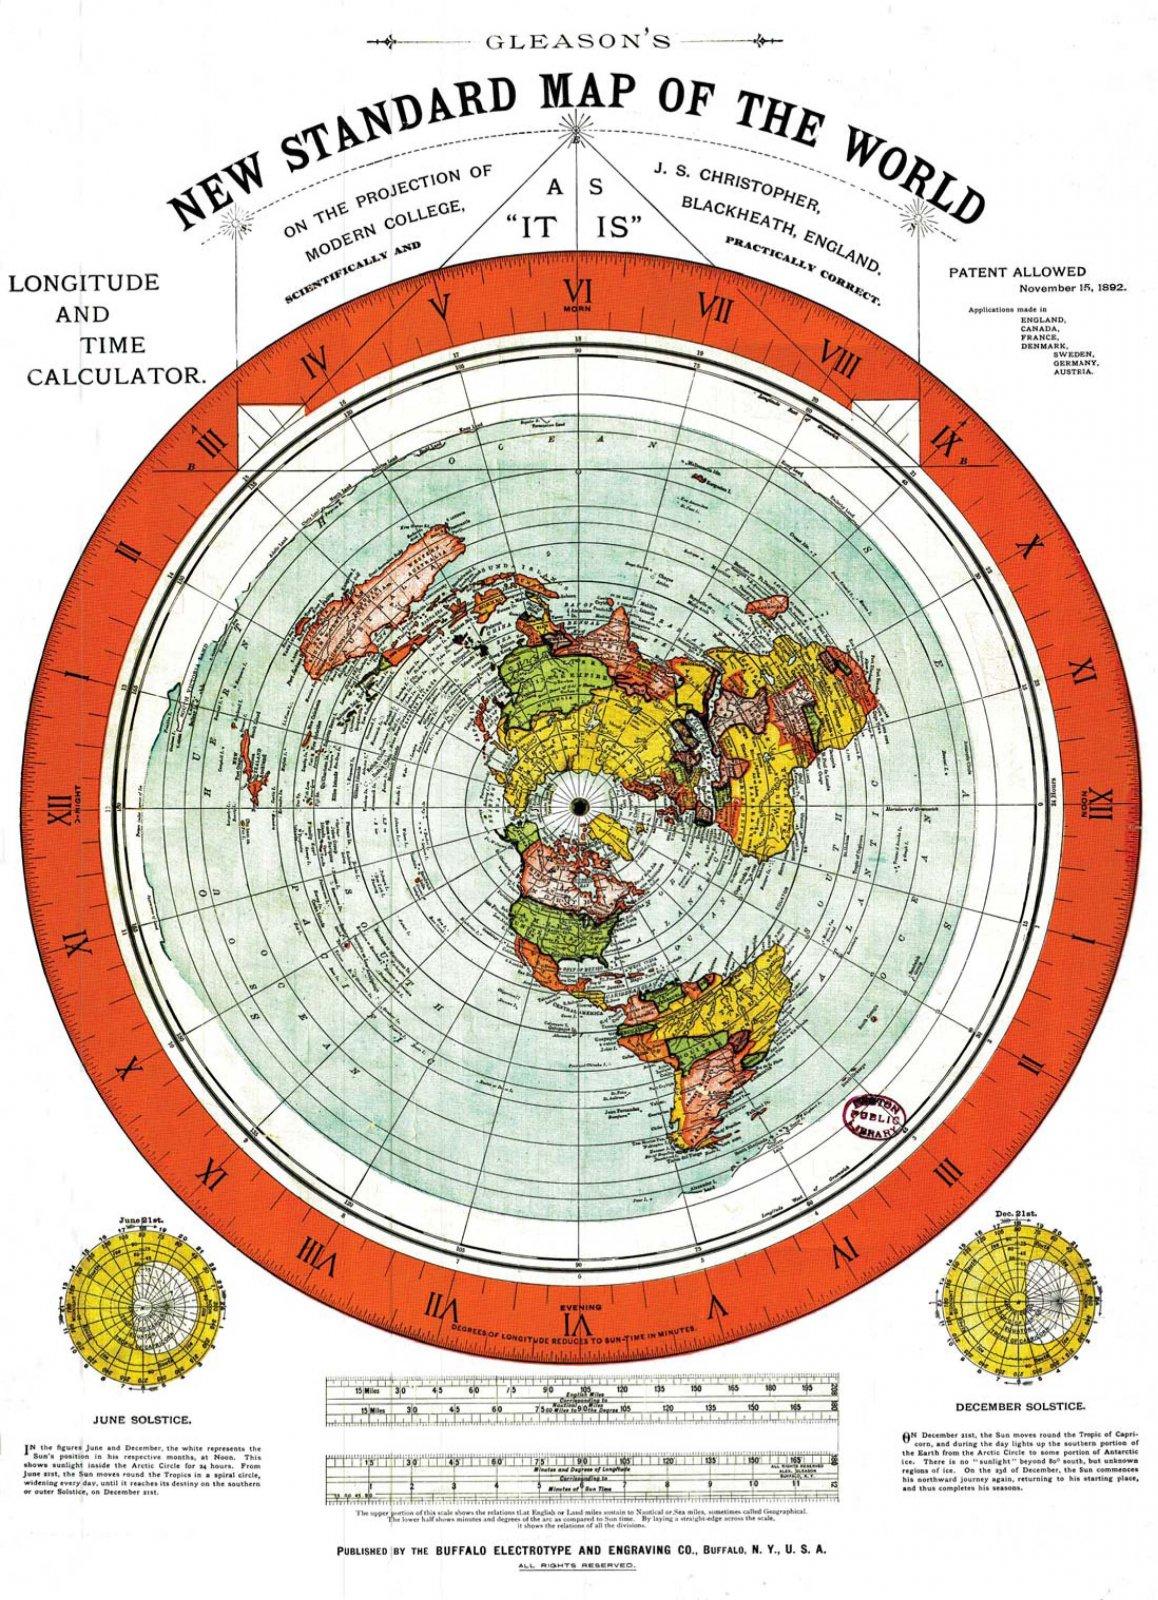 gleason's-flat-earth-map.jpg